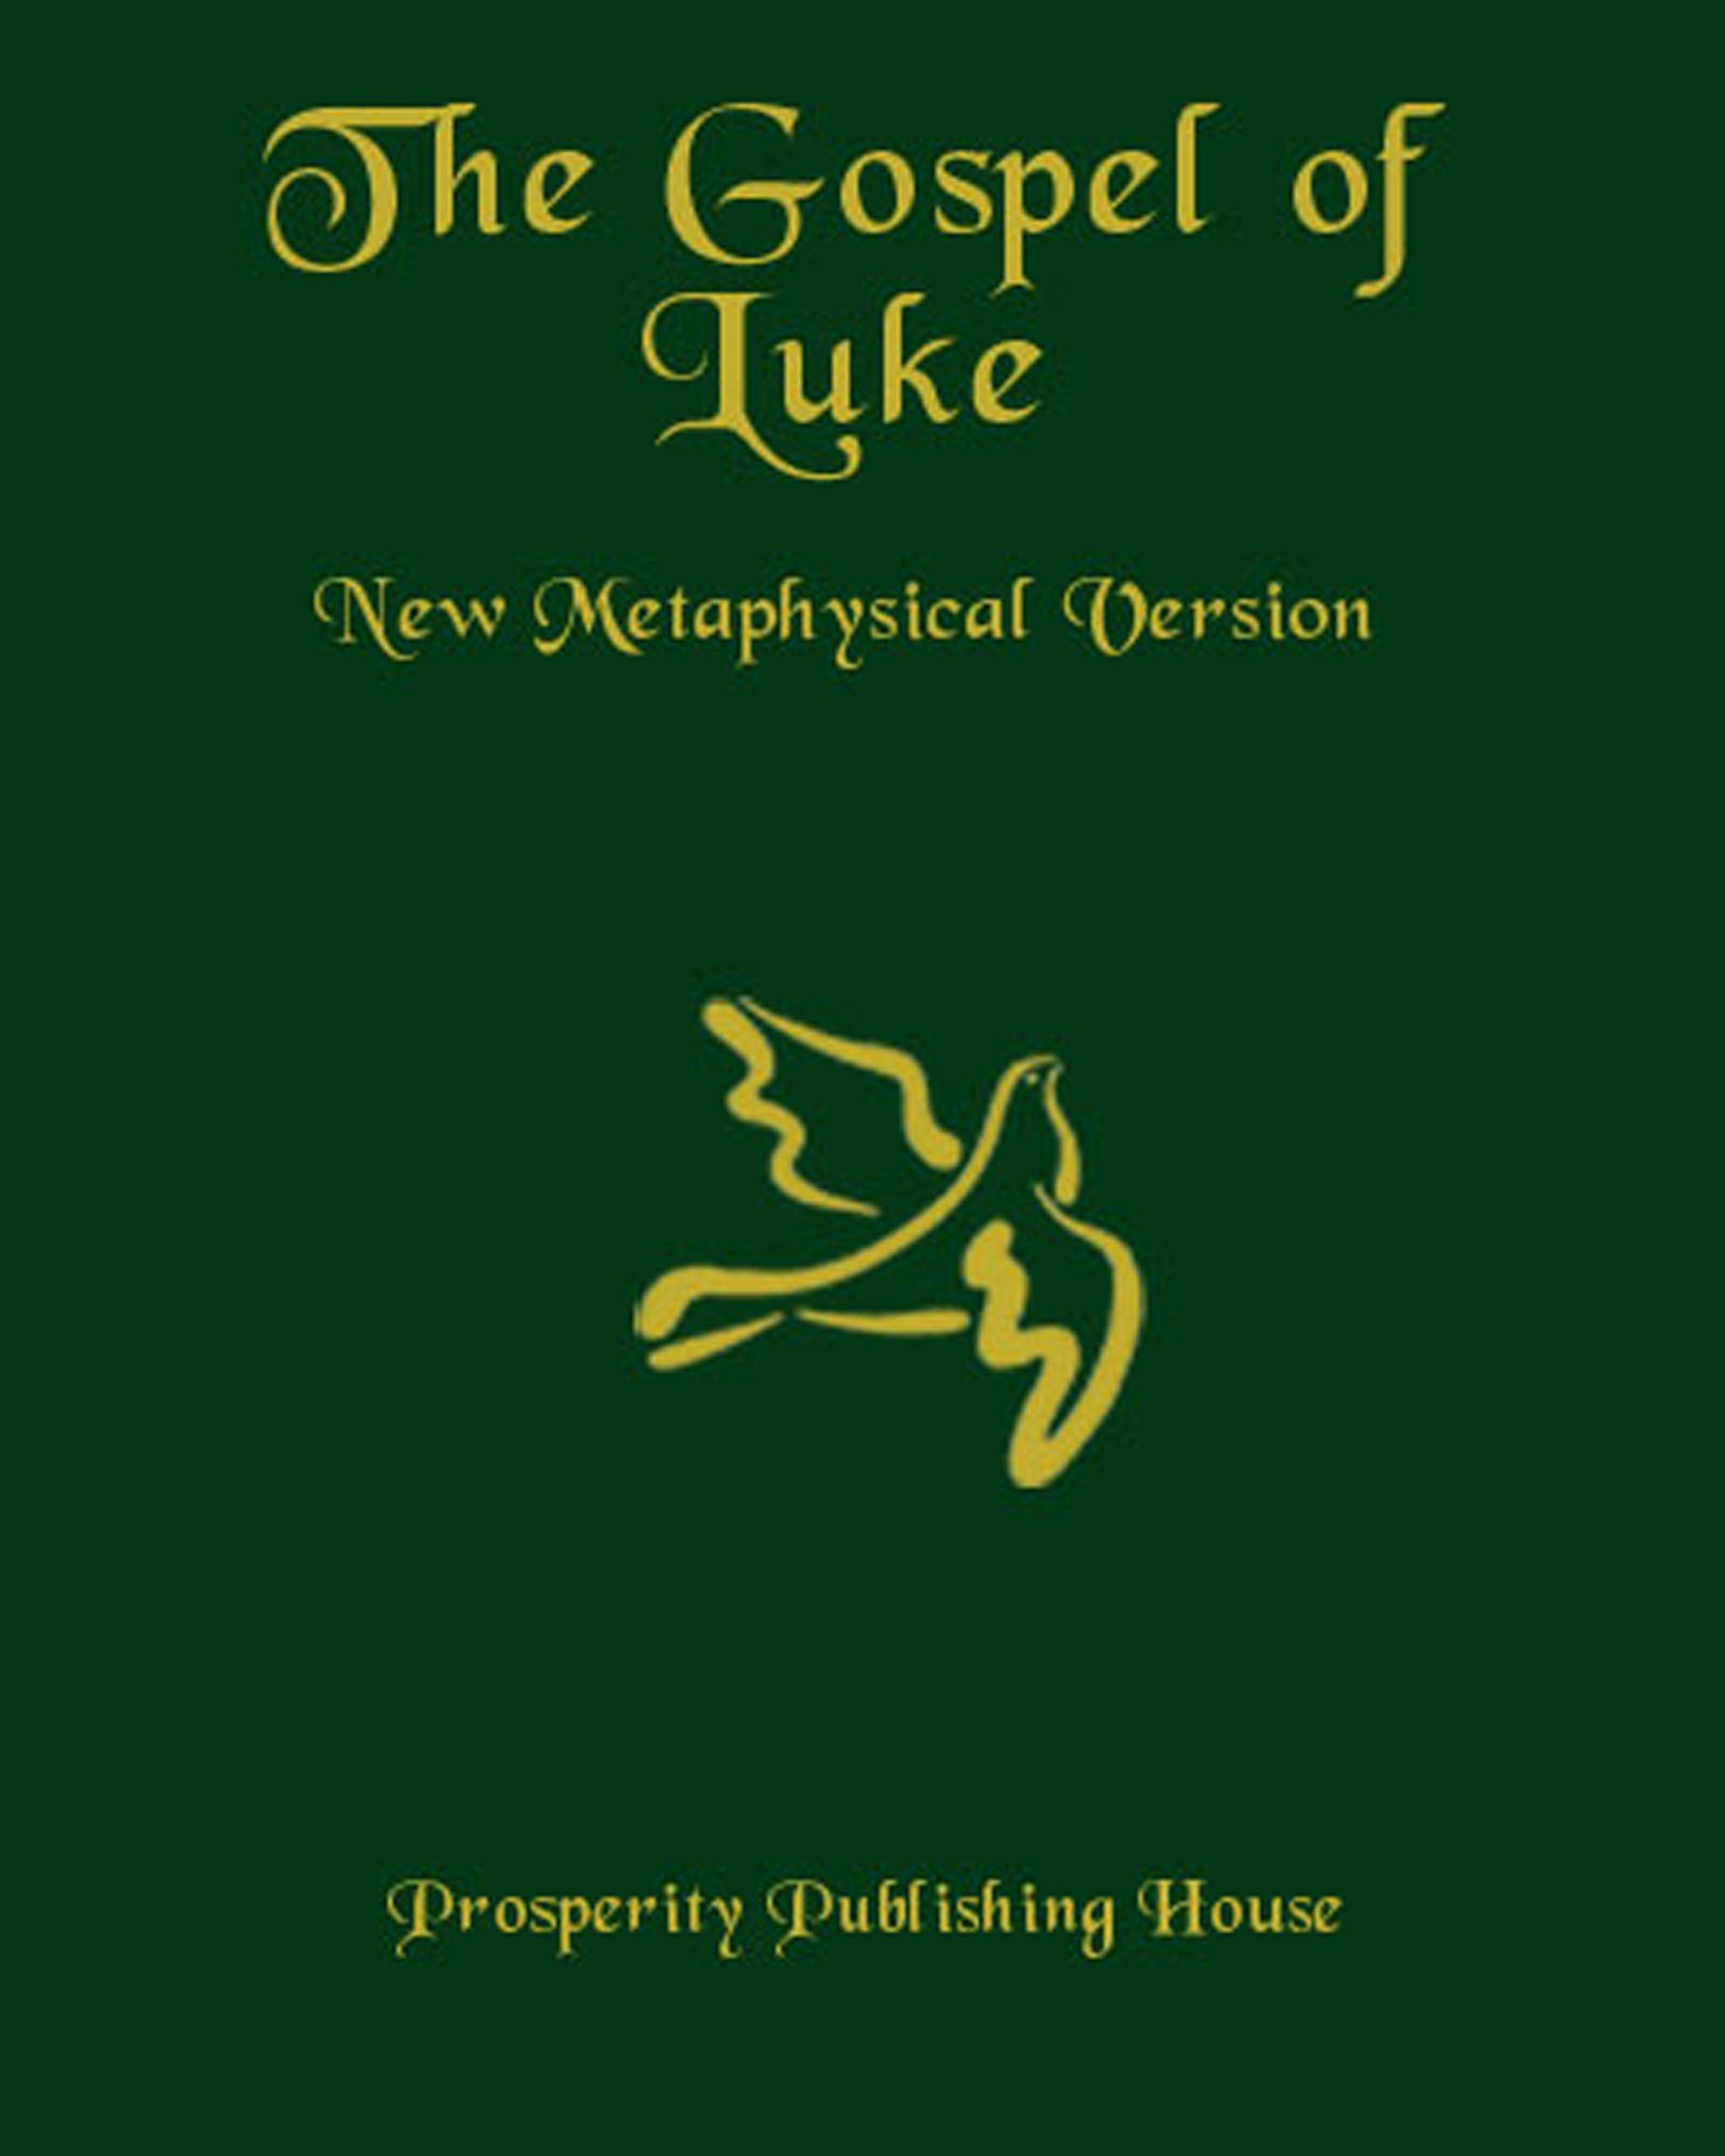 Introduction: A hermeneutical prologue